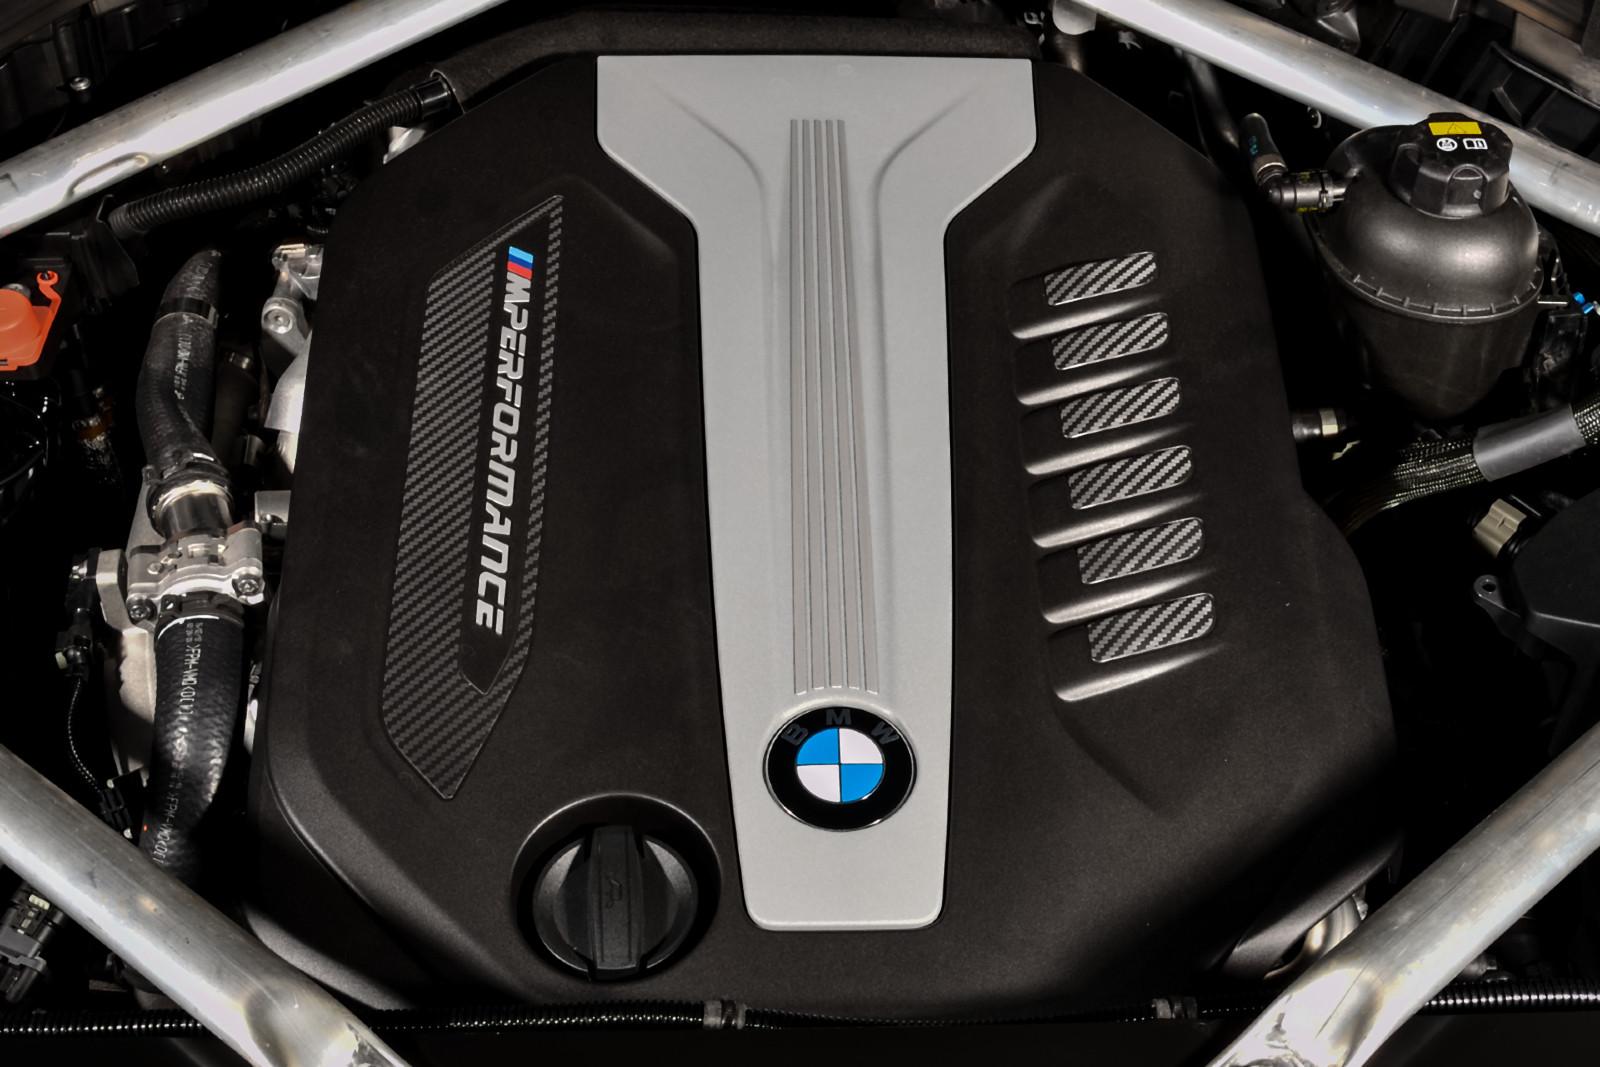 BMW X5 M50d si BMW X7 M50d Final Edition - BMW X5 M50d si BMW X7 M50d Final Edition